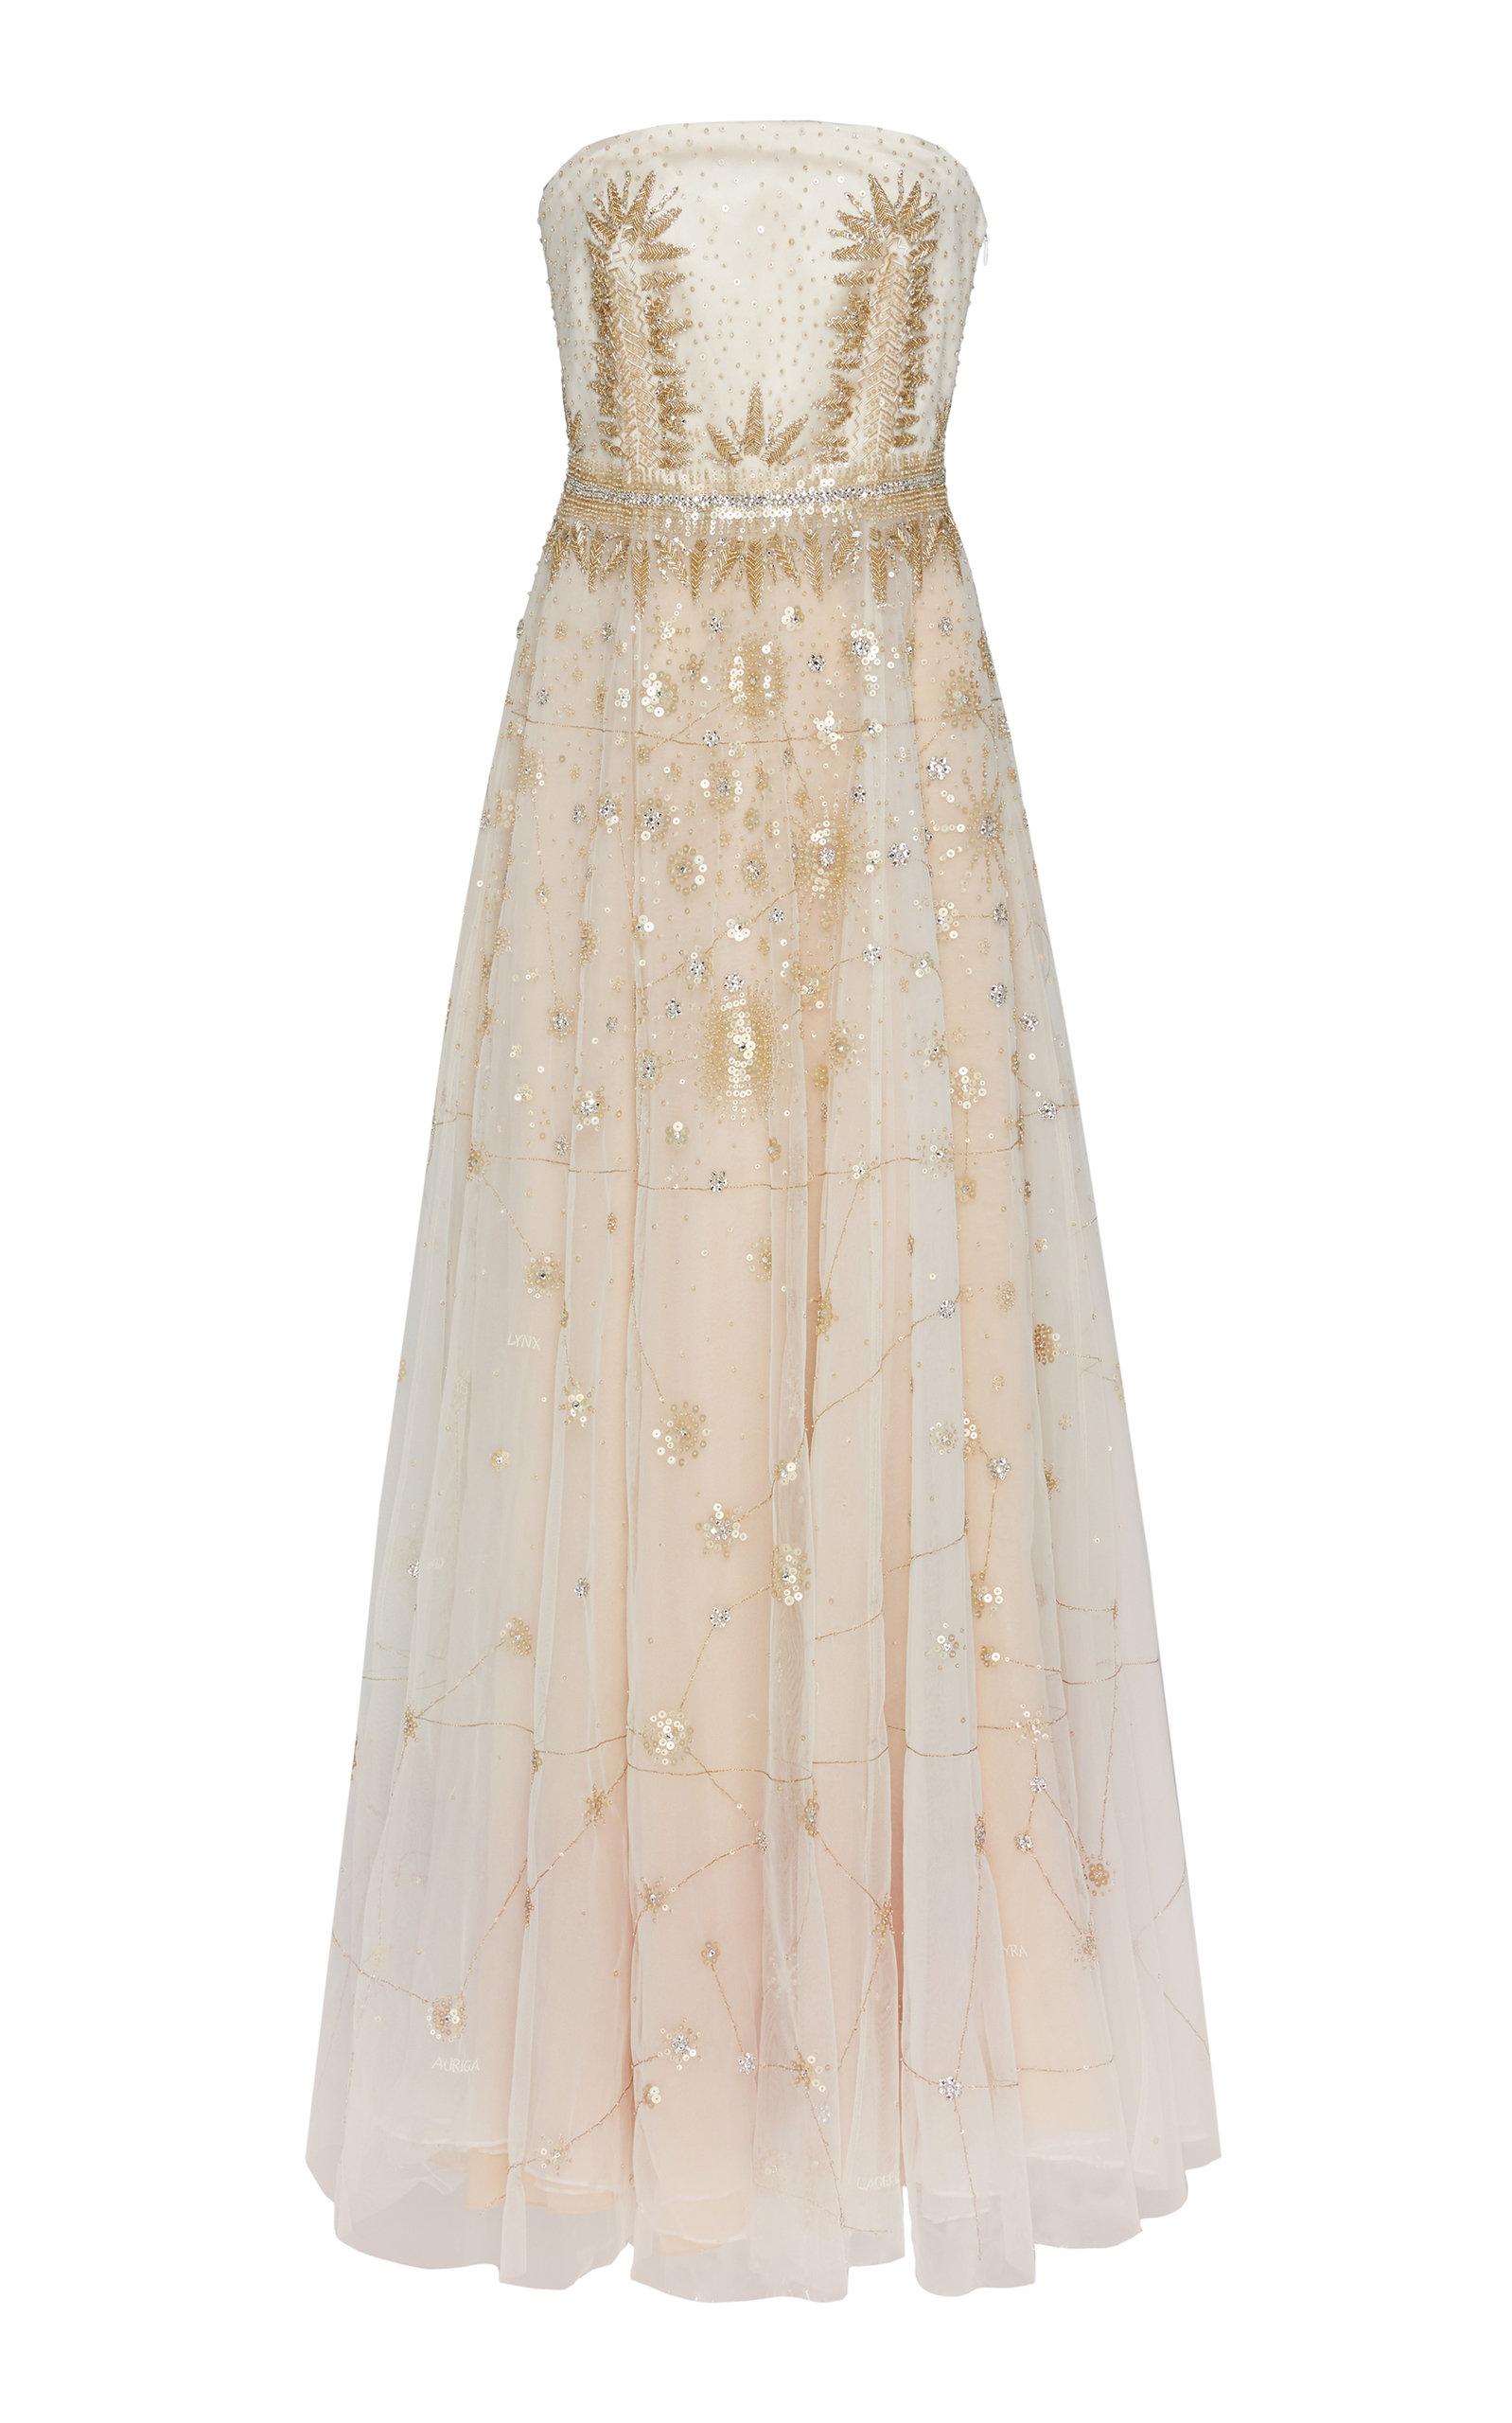 CUCCULELLI SHAHEEN Customizable Constellation Silk Gown in Pink